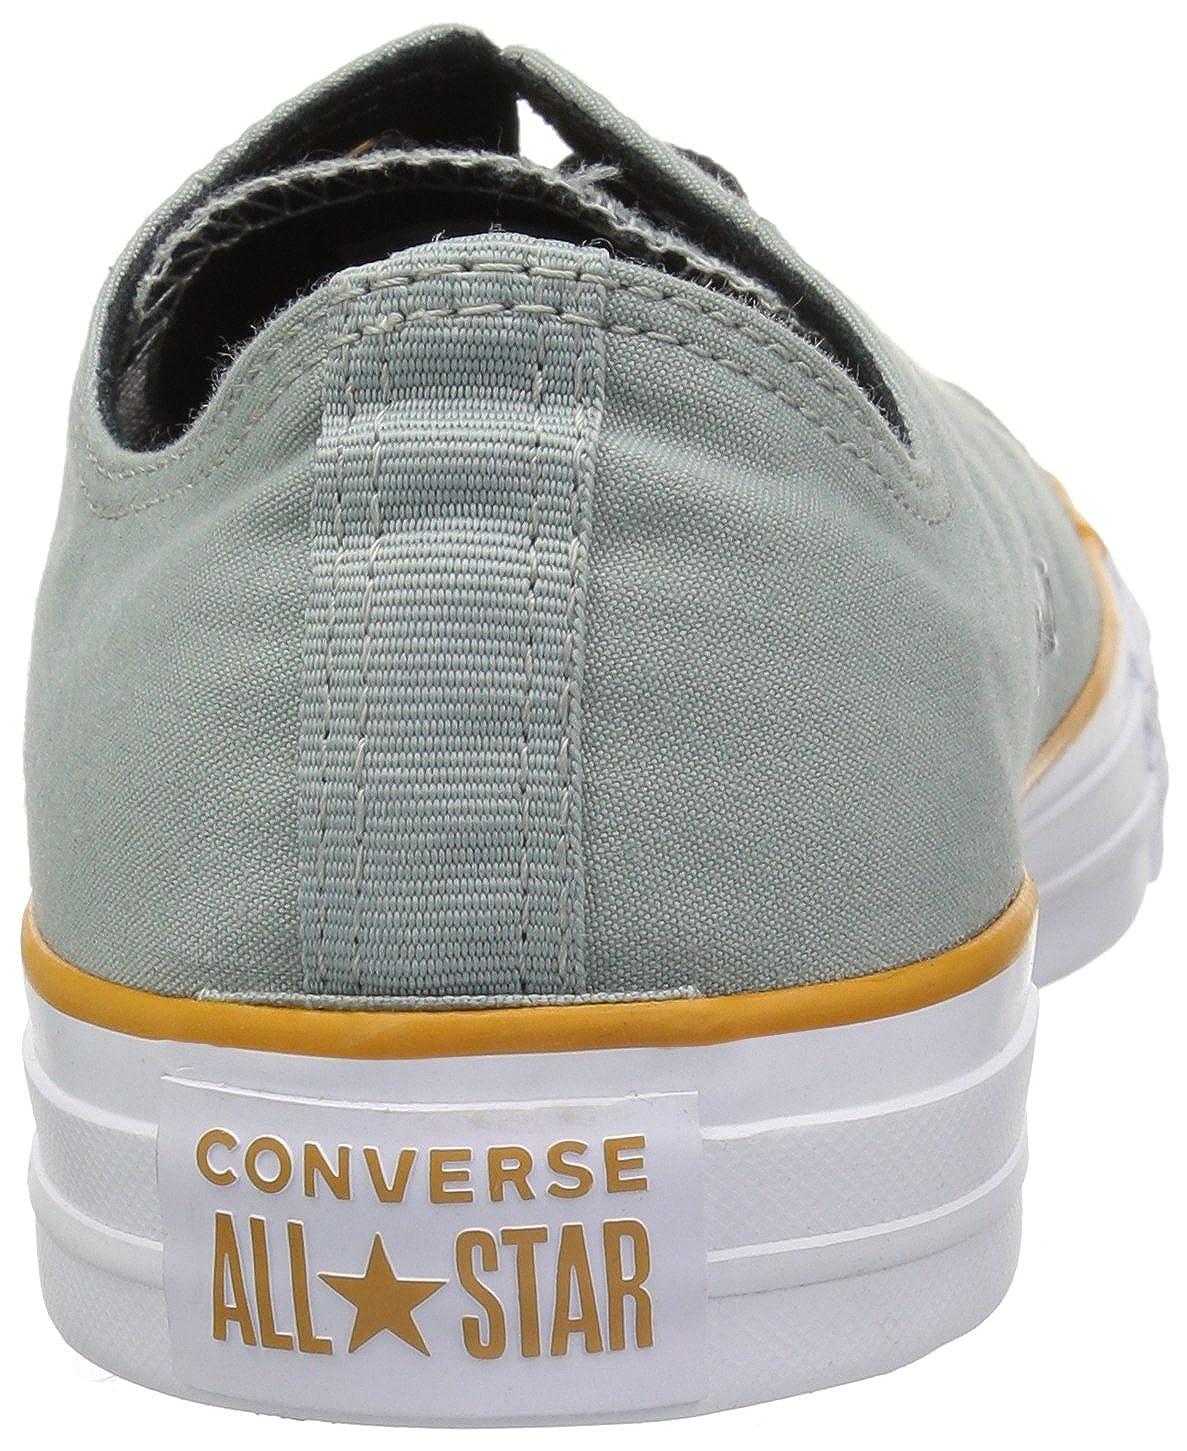 Converse - Chuck Chuck Chuck Taylor All Star Low Top, Farbblock Unisex-Erwachsene  d0bcc5